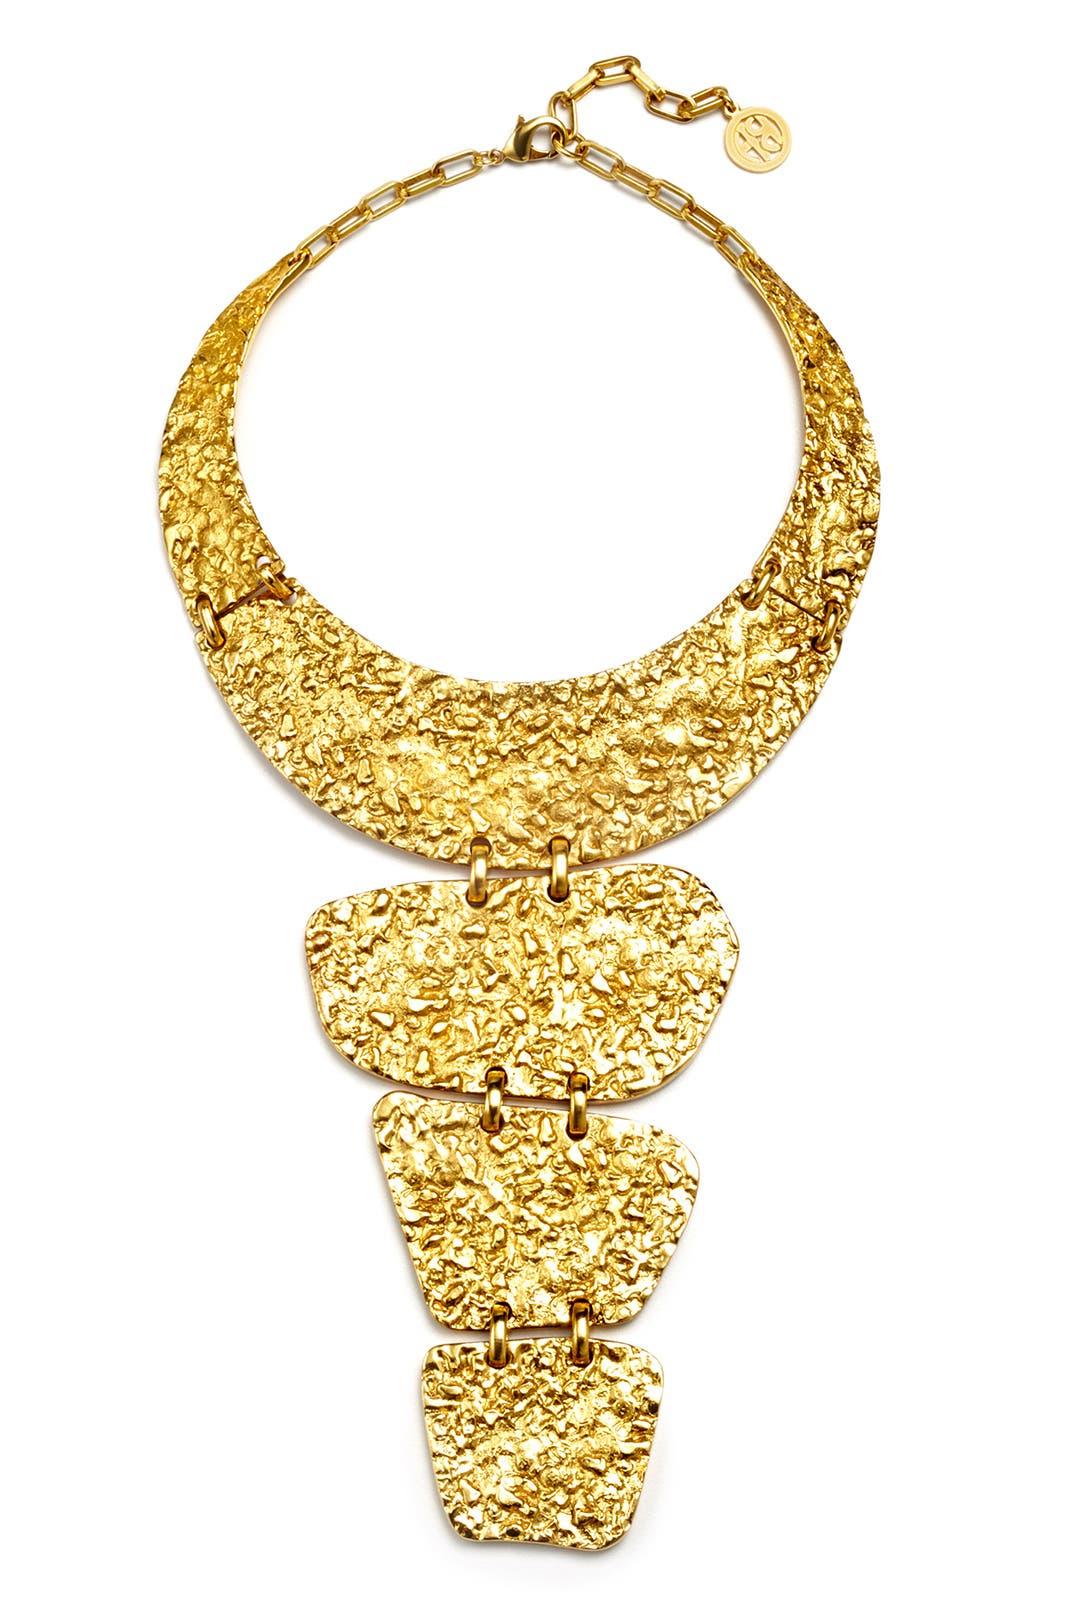 Euphrates Necklace by Ben-Amun